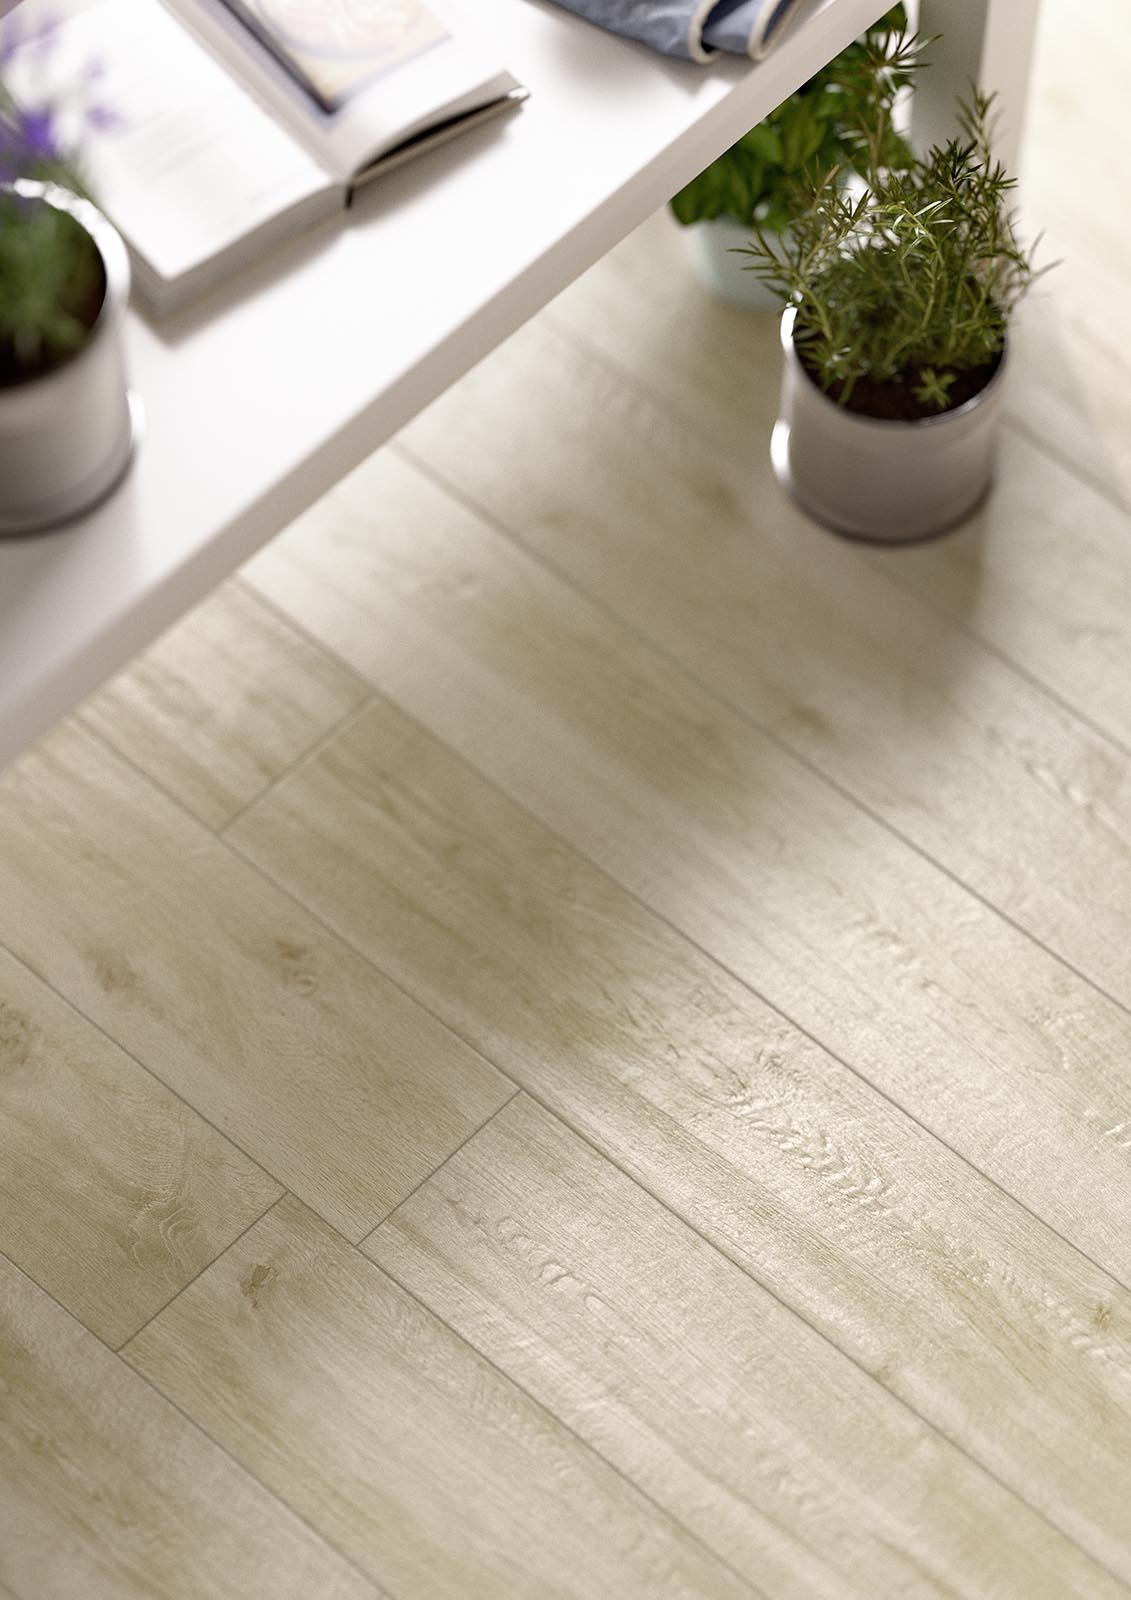 Treverkway pavimento de gres imitaci n madera marazzi - Pavimento imitacion madera ...